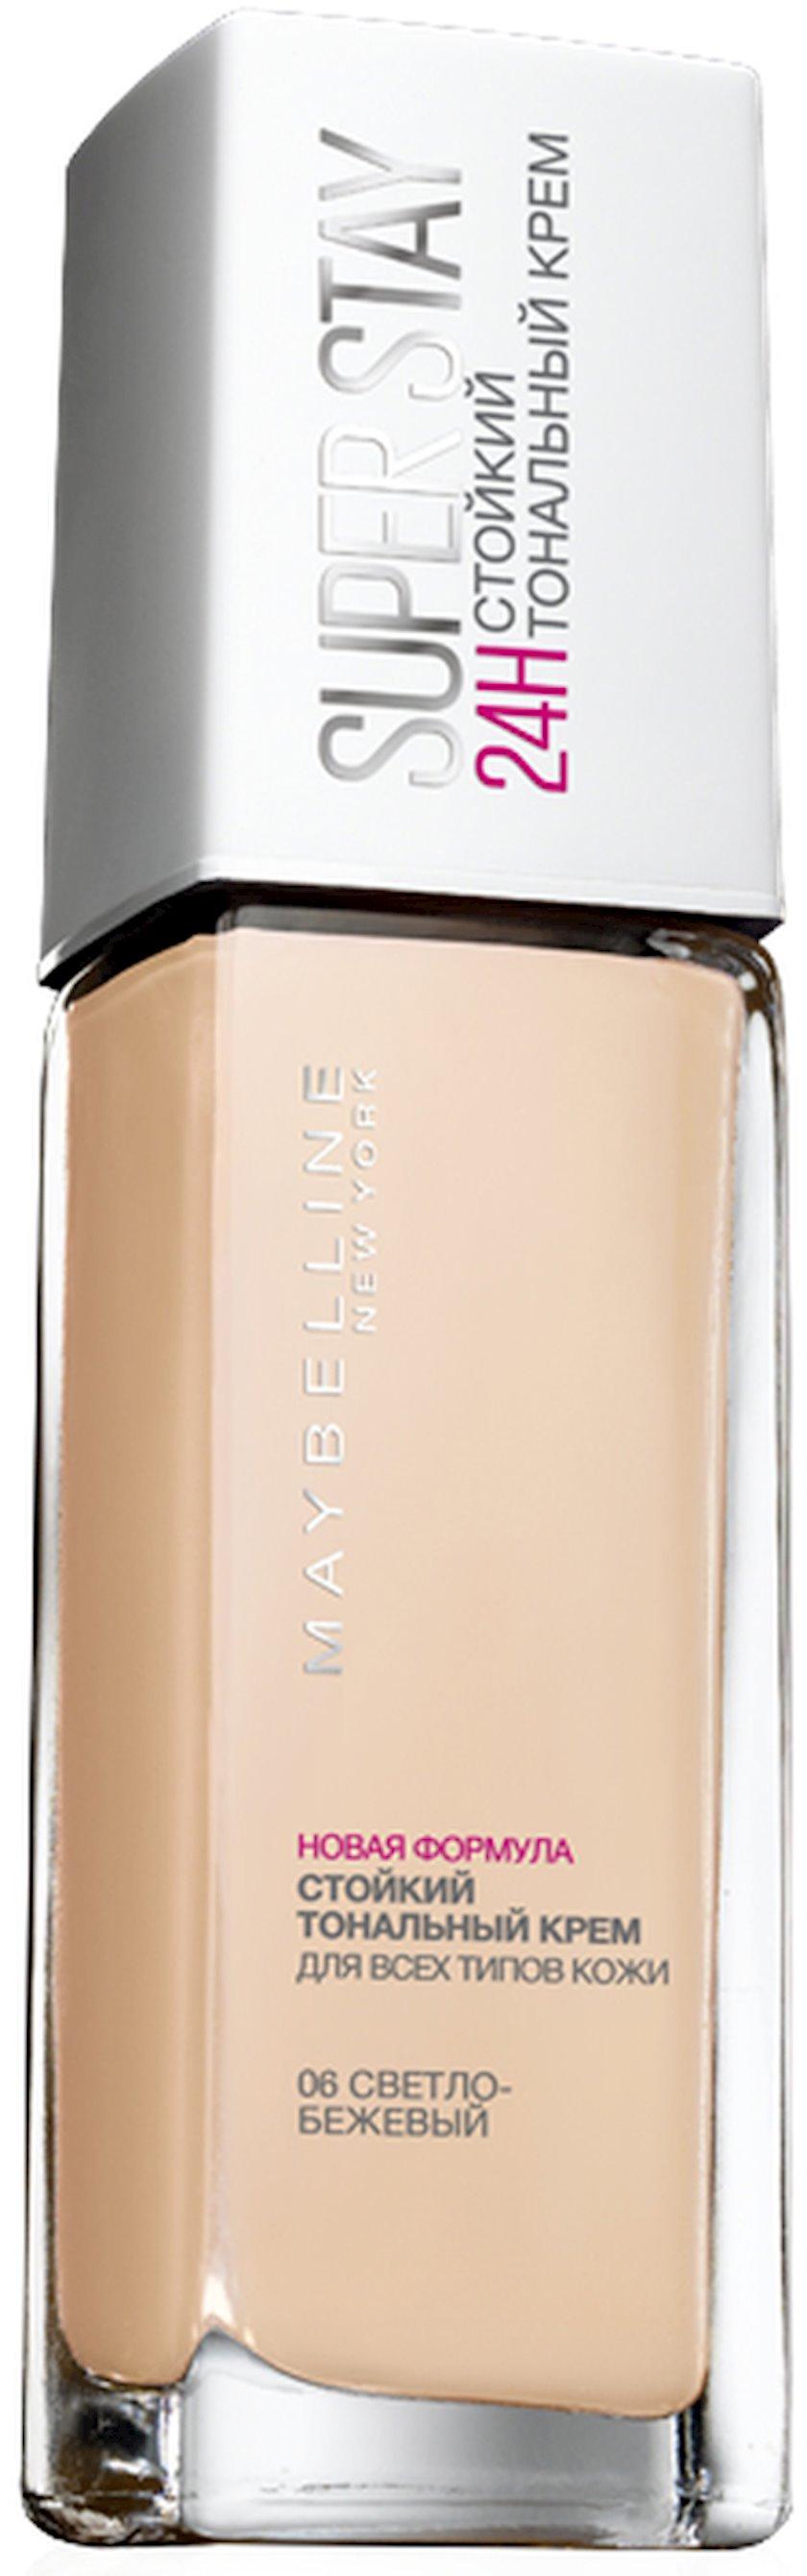 Tonal krem Maybelline New York SuperStay 24H çalar 06 Açıq bej 30 ml